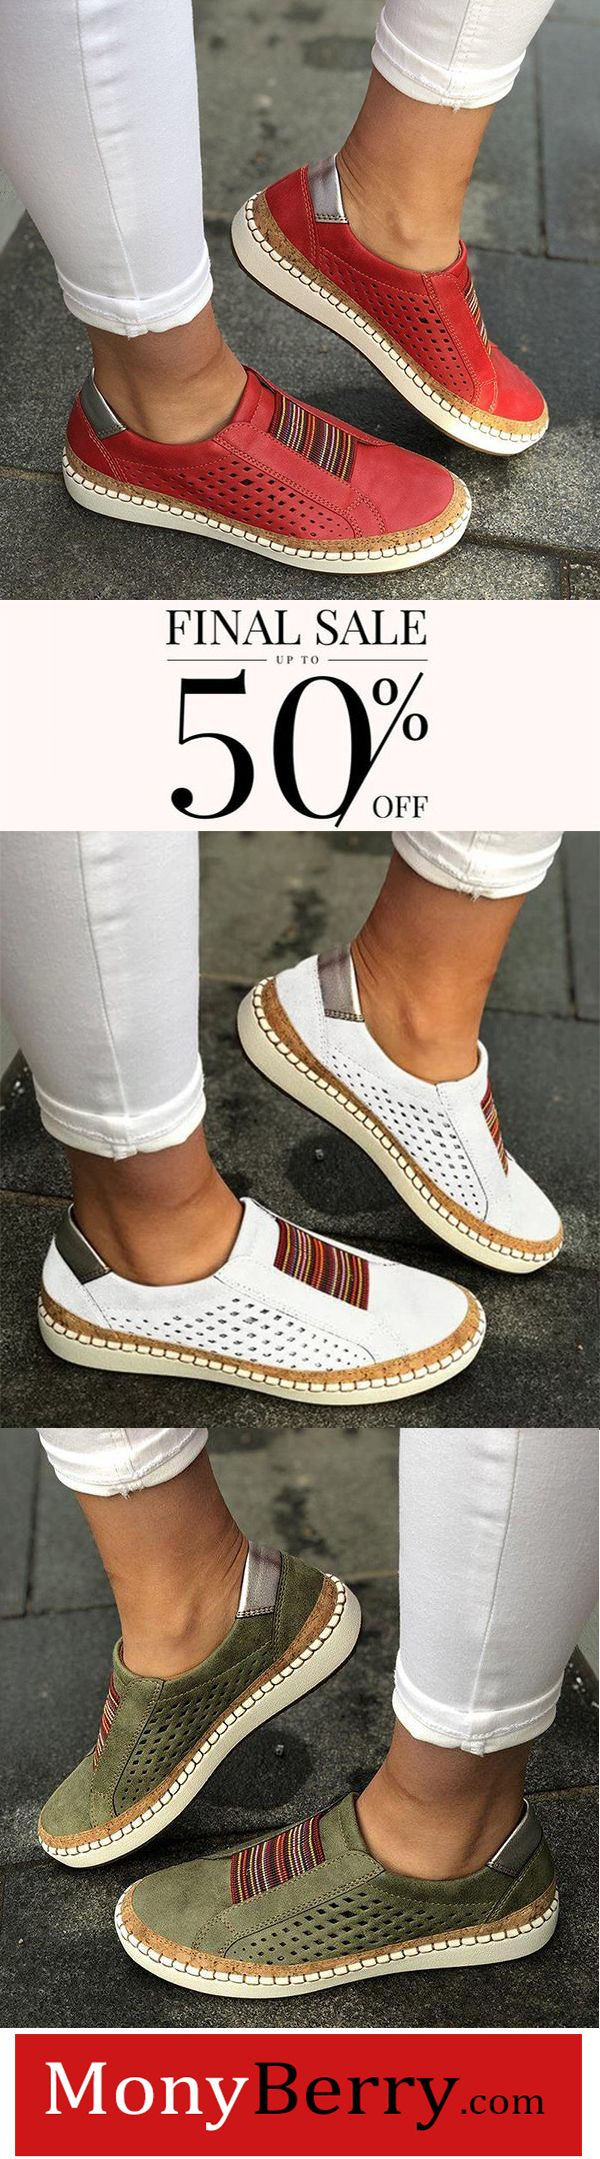 Comfortable Flat Bottom Breathable Shoes